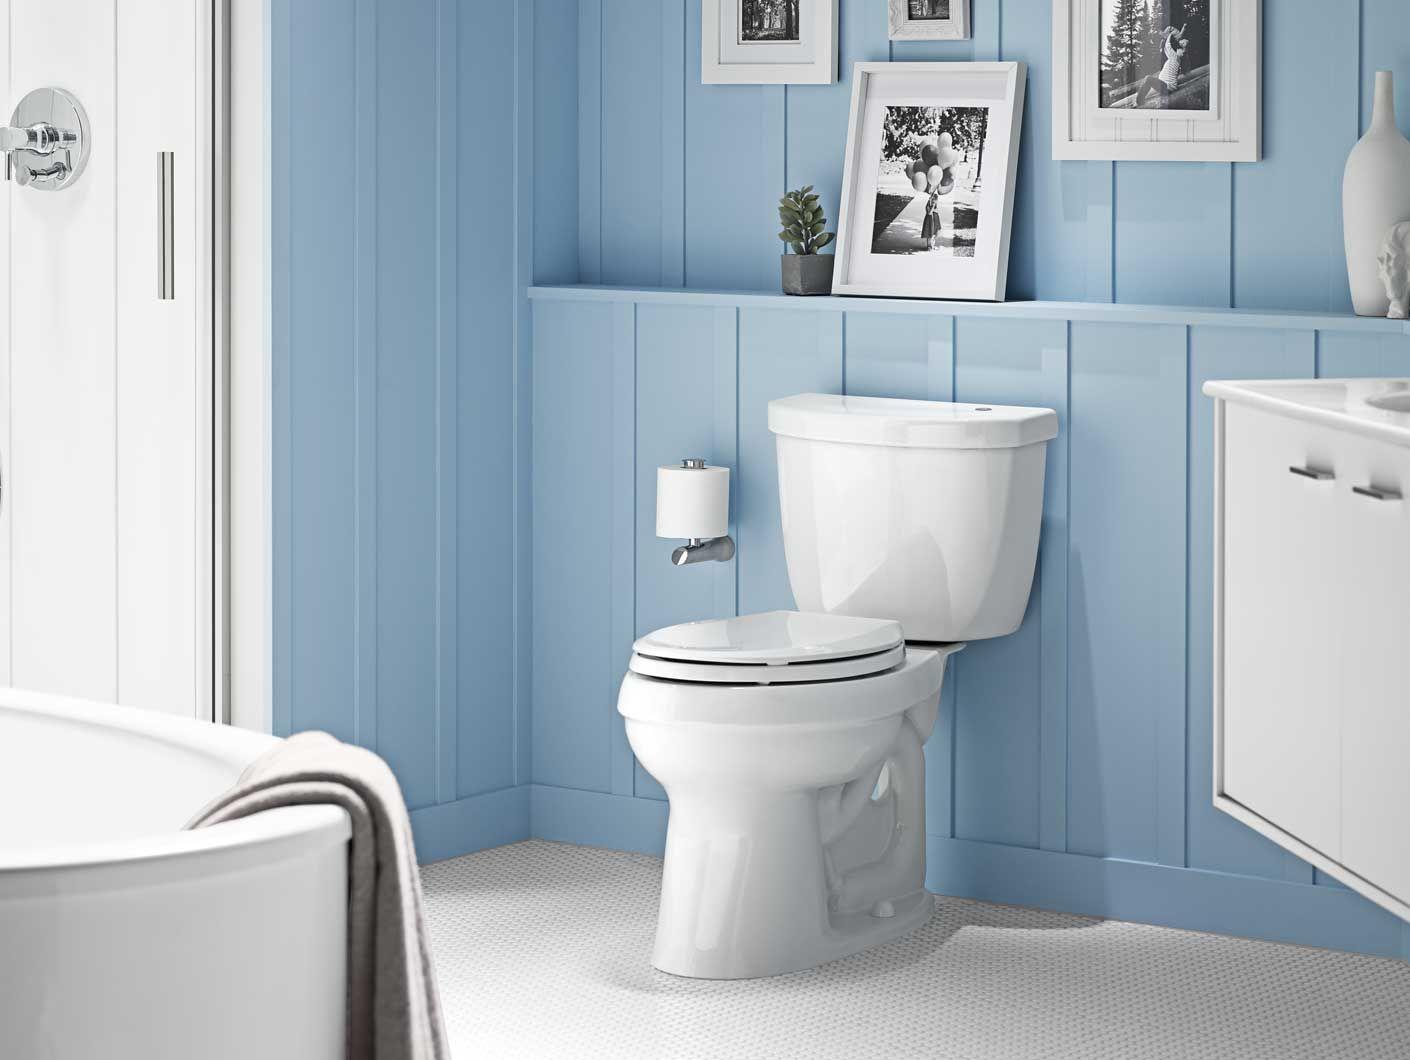 KOHLER   Touchless Toilets and Flush Kit, The No Touch Flush For ...